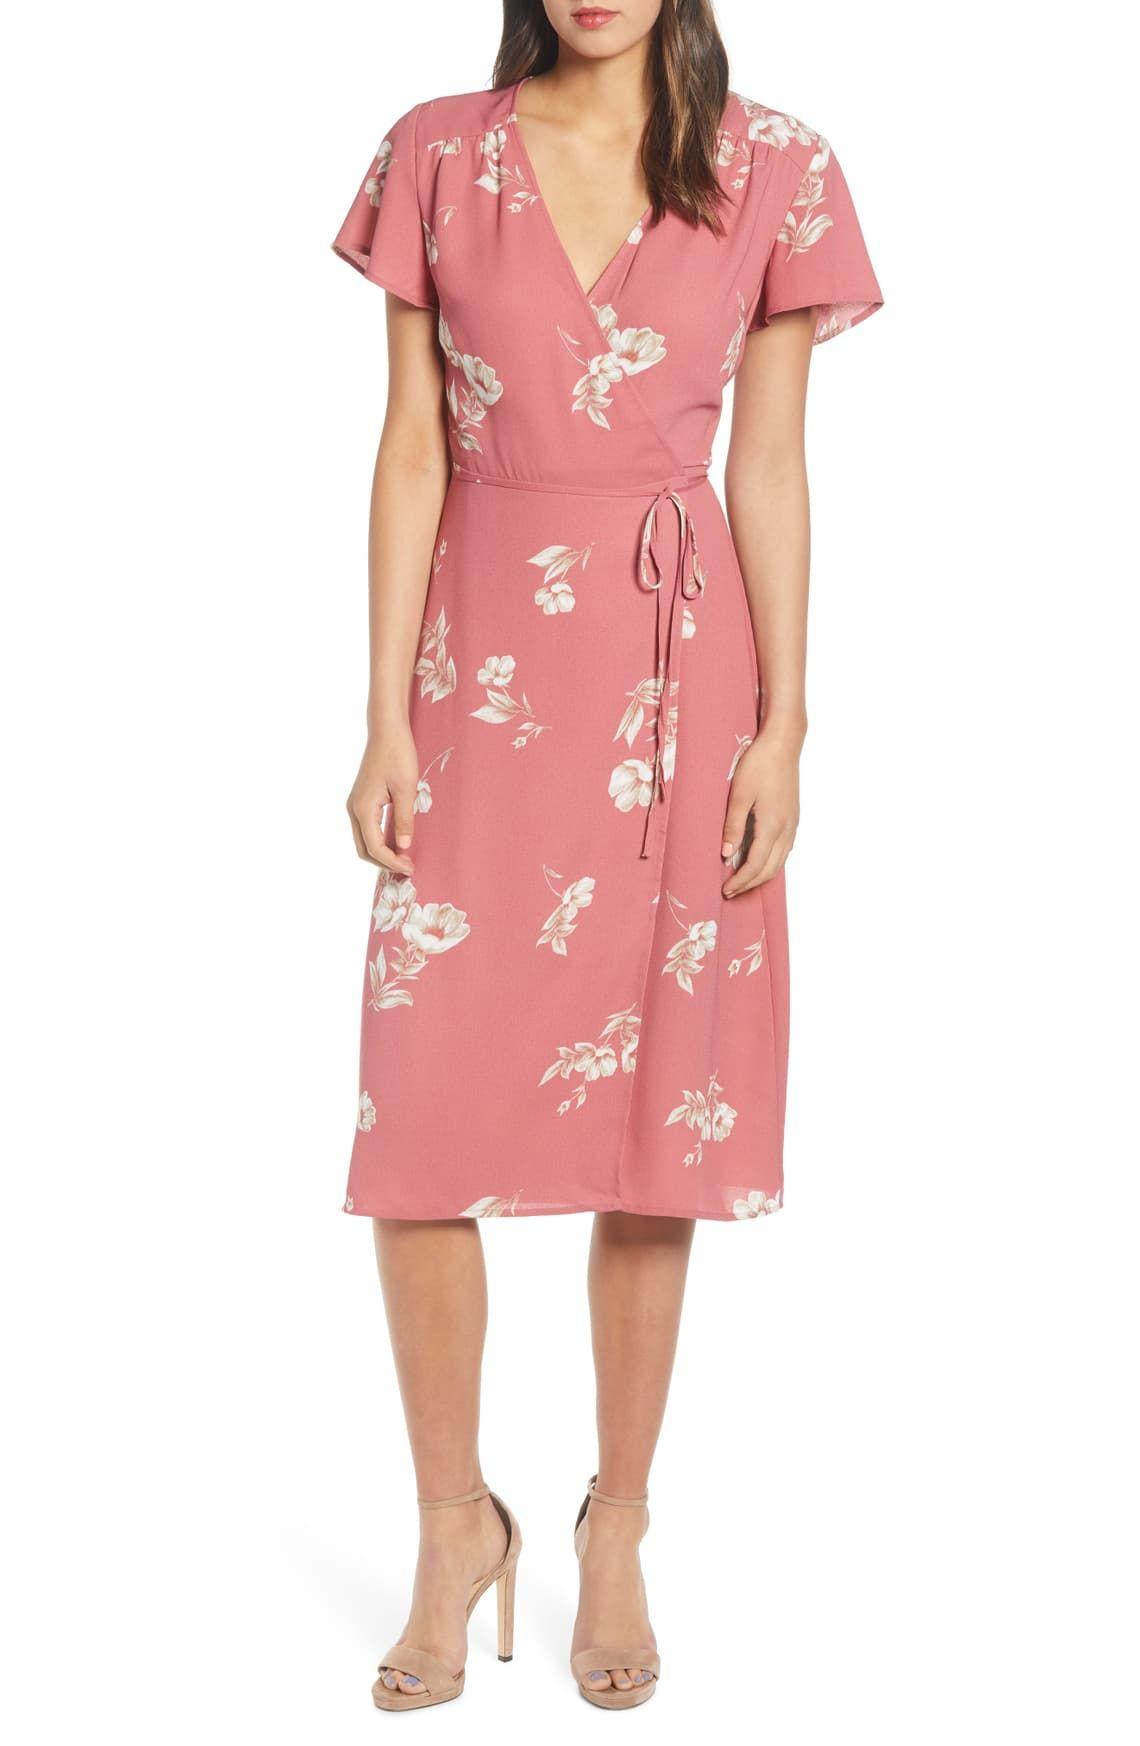 Leith Wrap Dress Nordstrom Wrap Dress Nordstrom Dresses Womens Dresses [ 1746 x 1140 Pixel ]